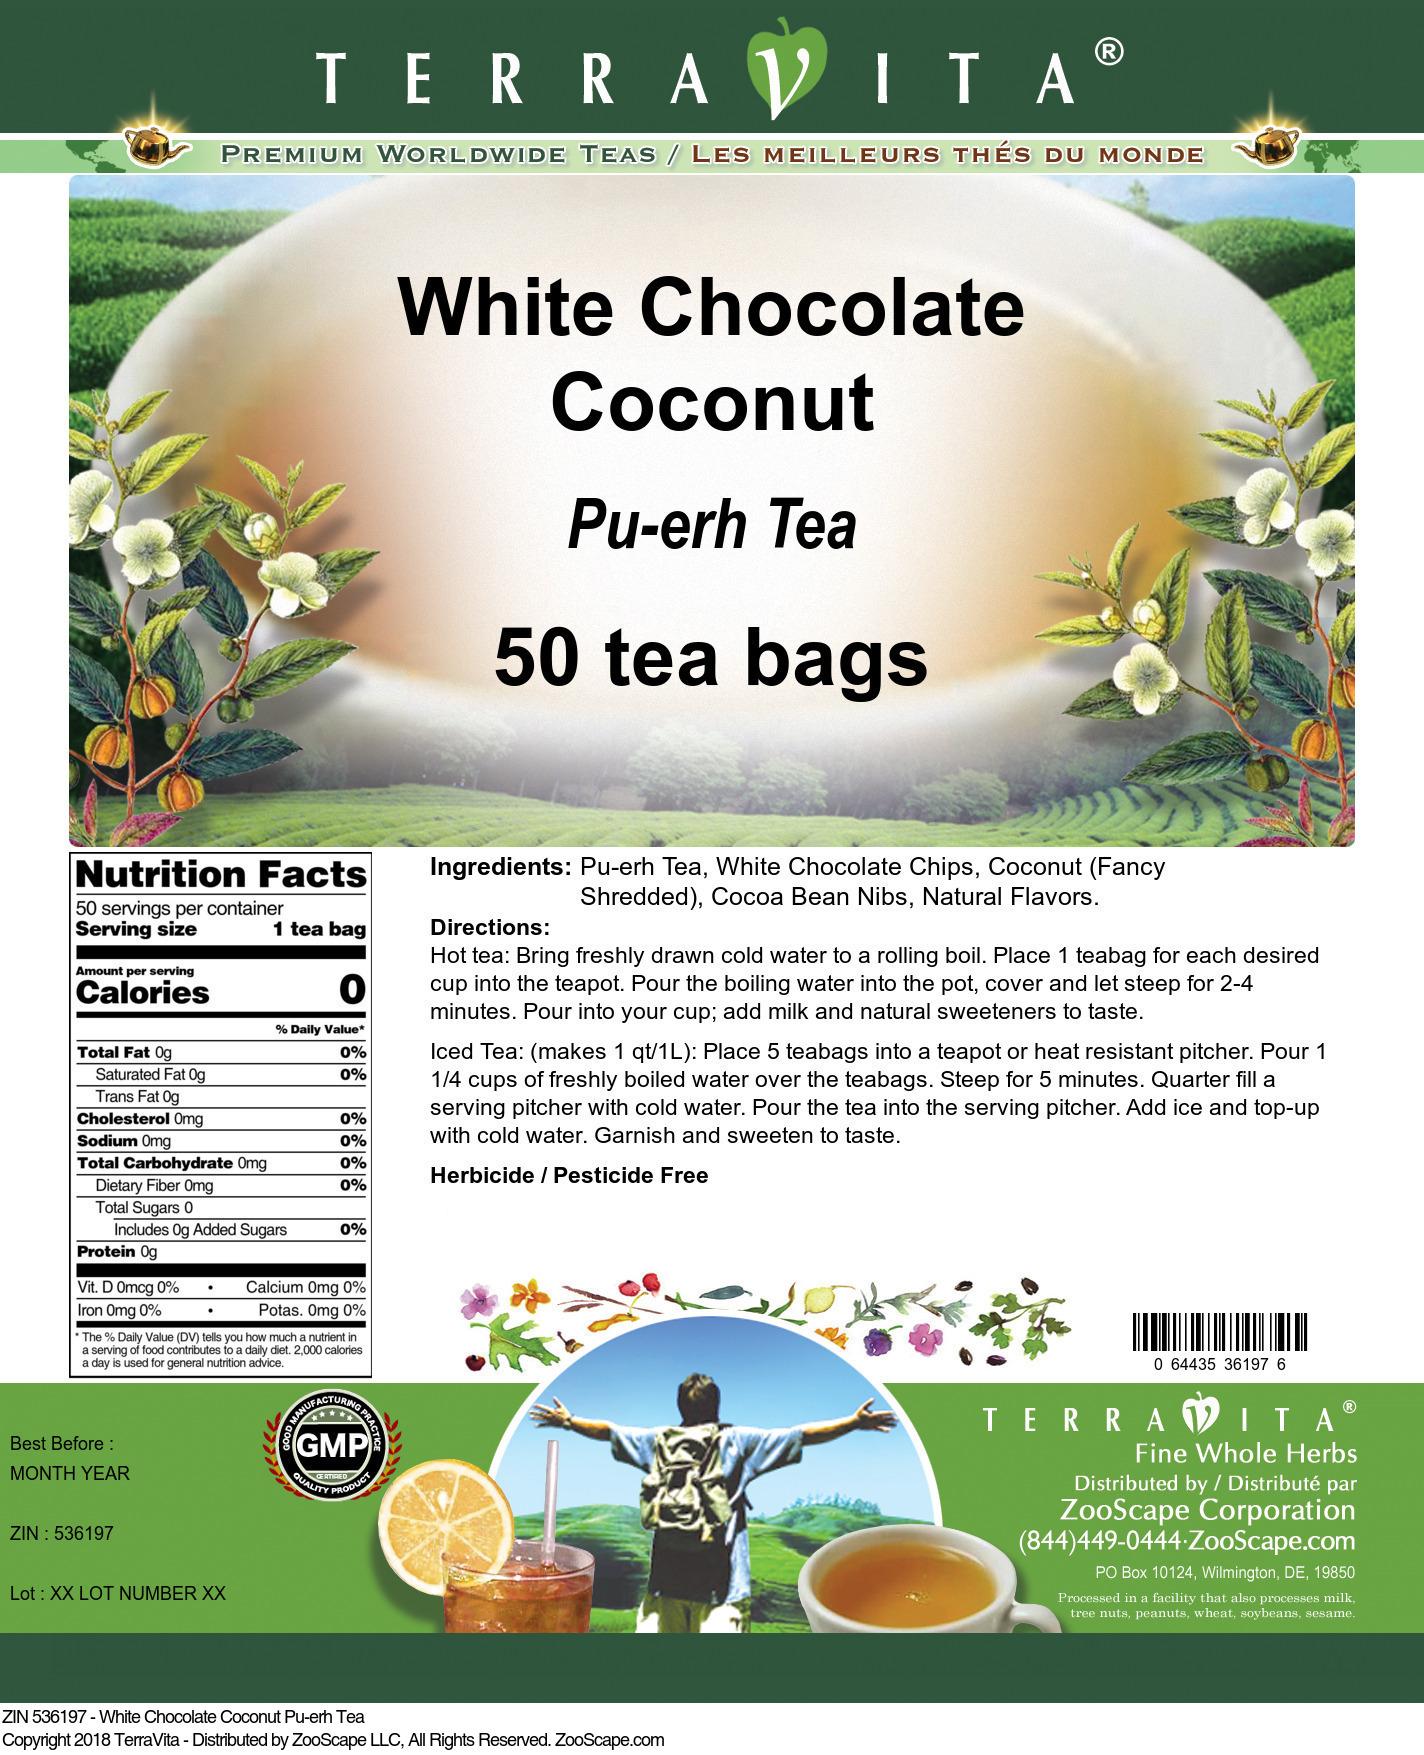 White Chocolate Coconut Pu-erh Tea